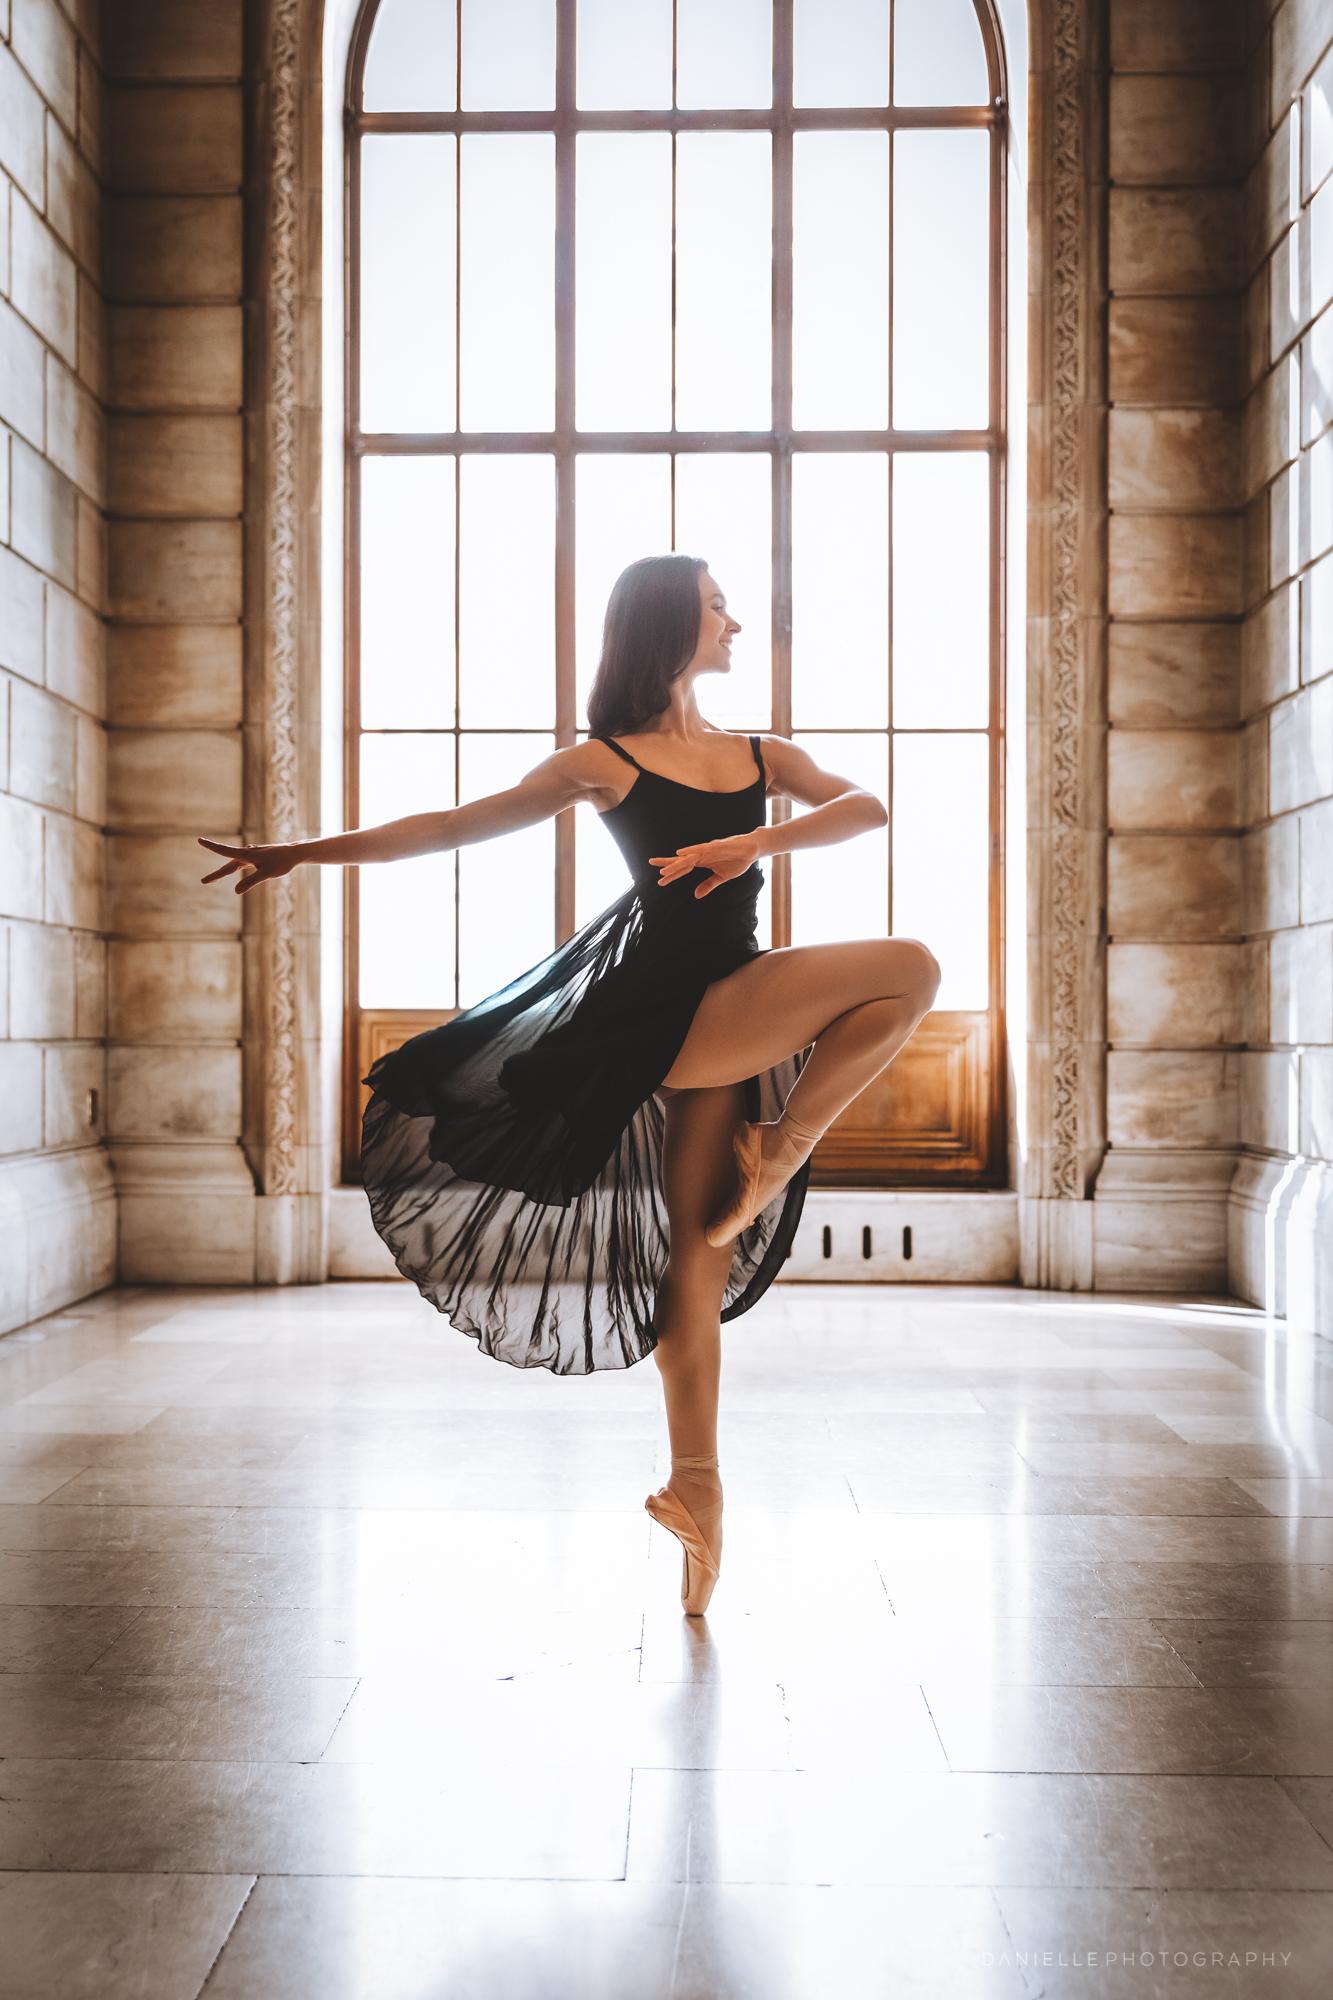 @DaniellePhotographySA_Ballerina_Photoshoot_NYPL-23-20.jpg